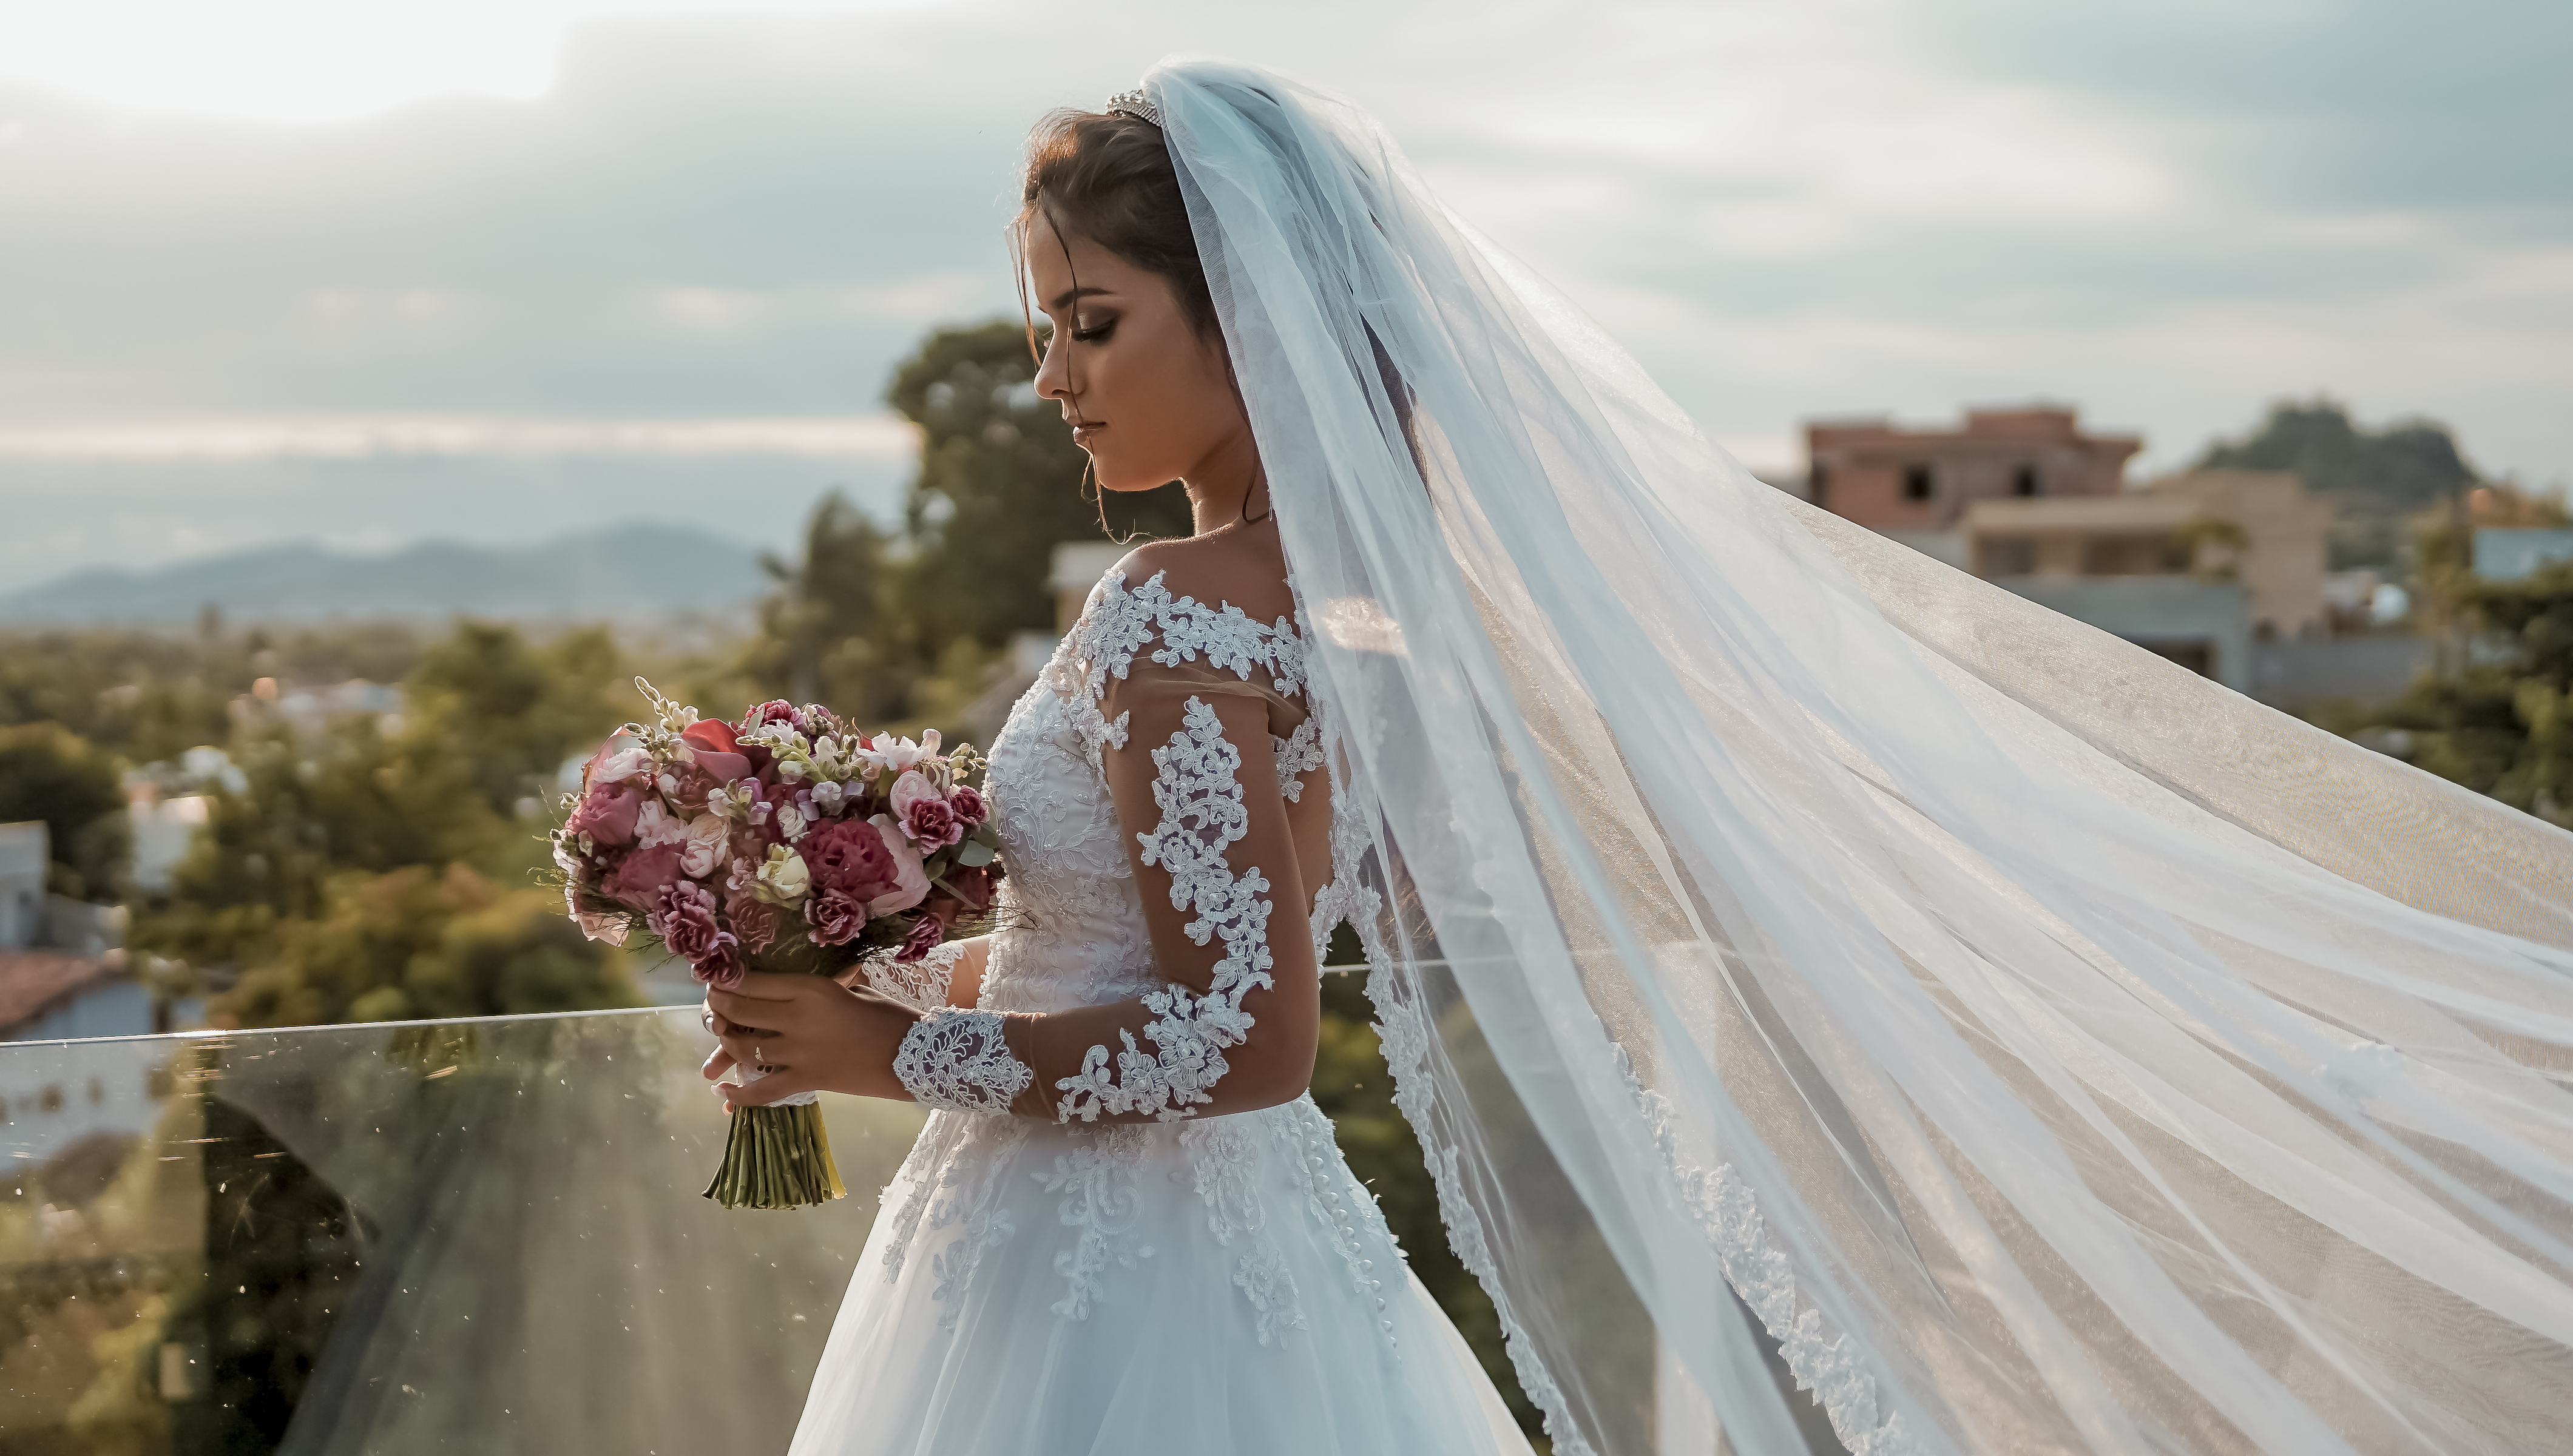 Contate Fotógrafo de Casamento  - Felipe Barros - Brasil